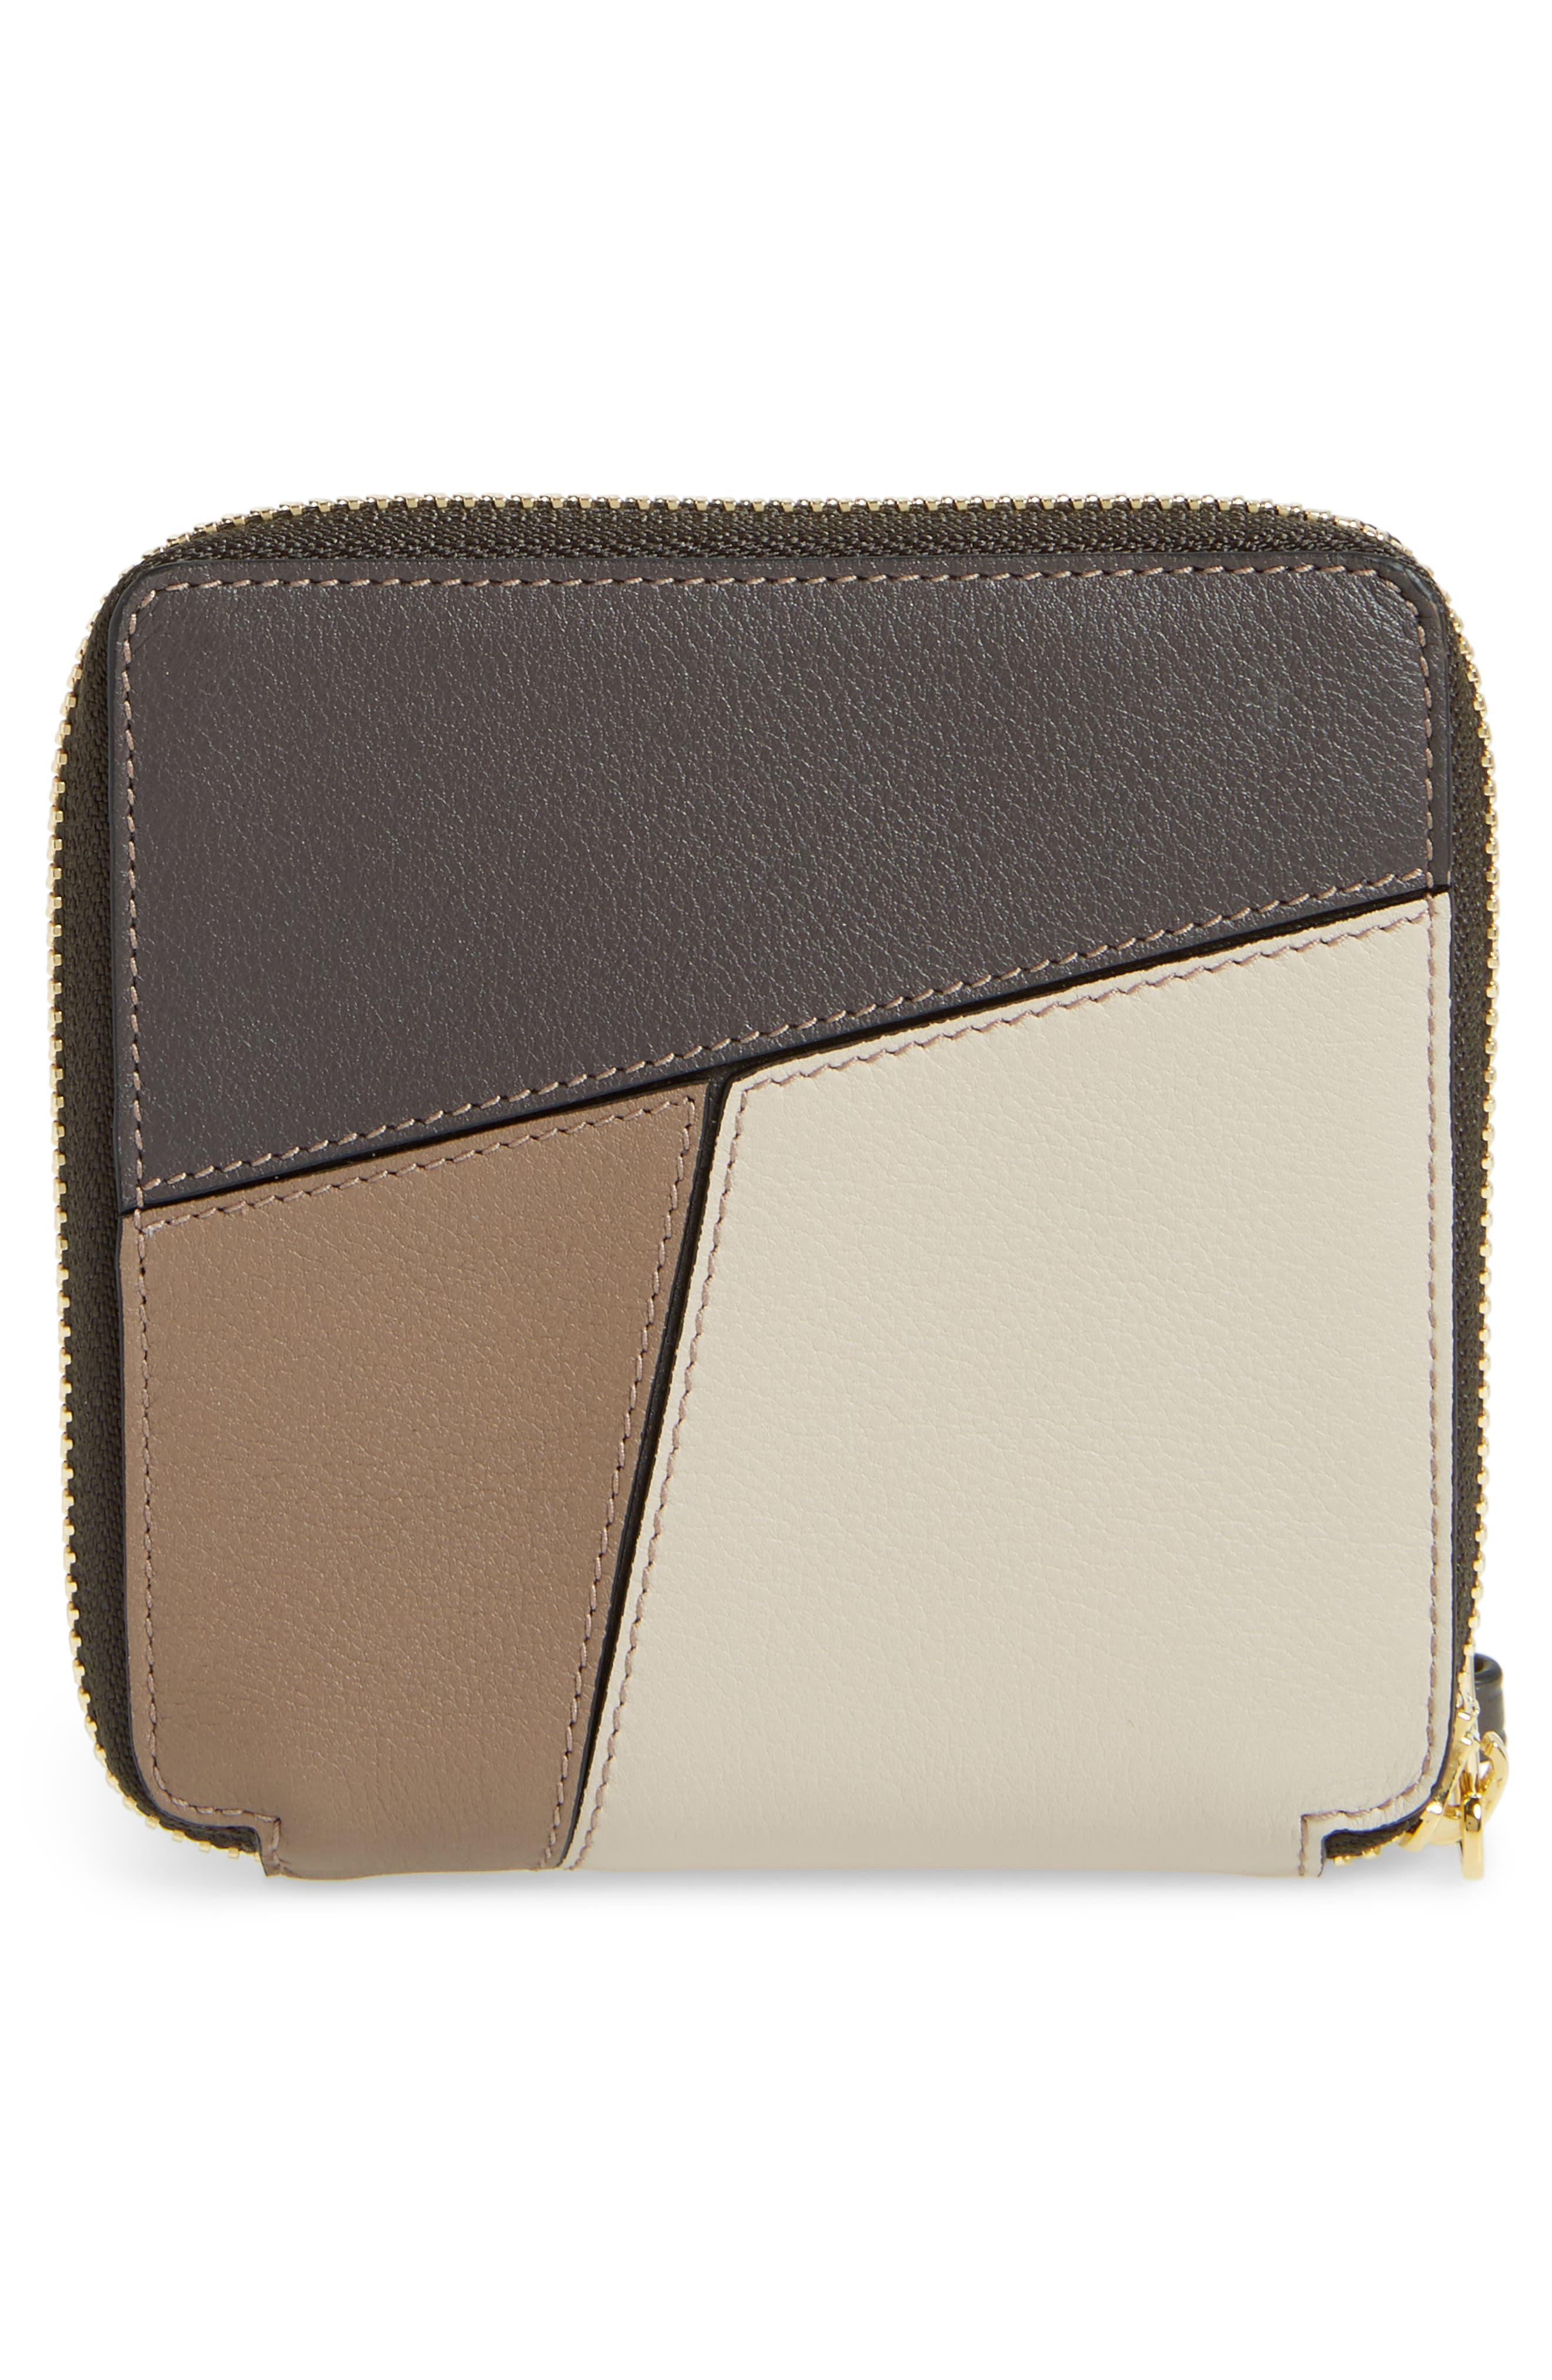 Denim Puzzle Colorblock Leather French Wallet,                             Alternate thumbnail 4, color,                             200